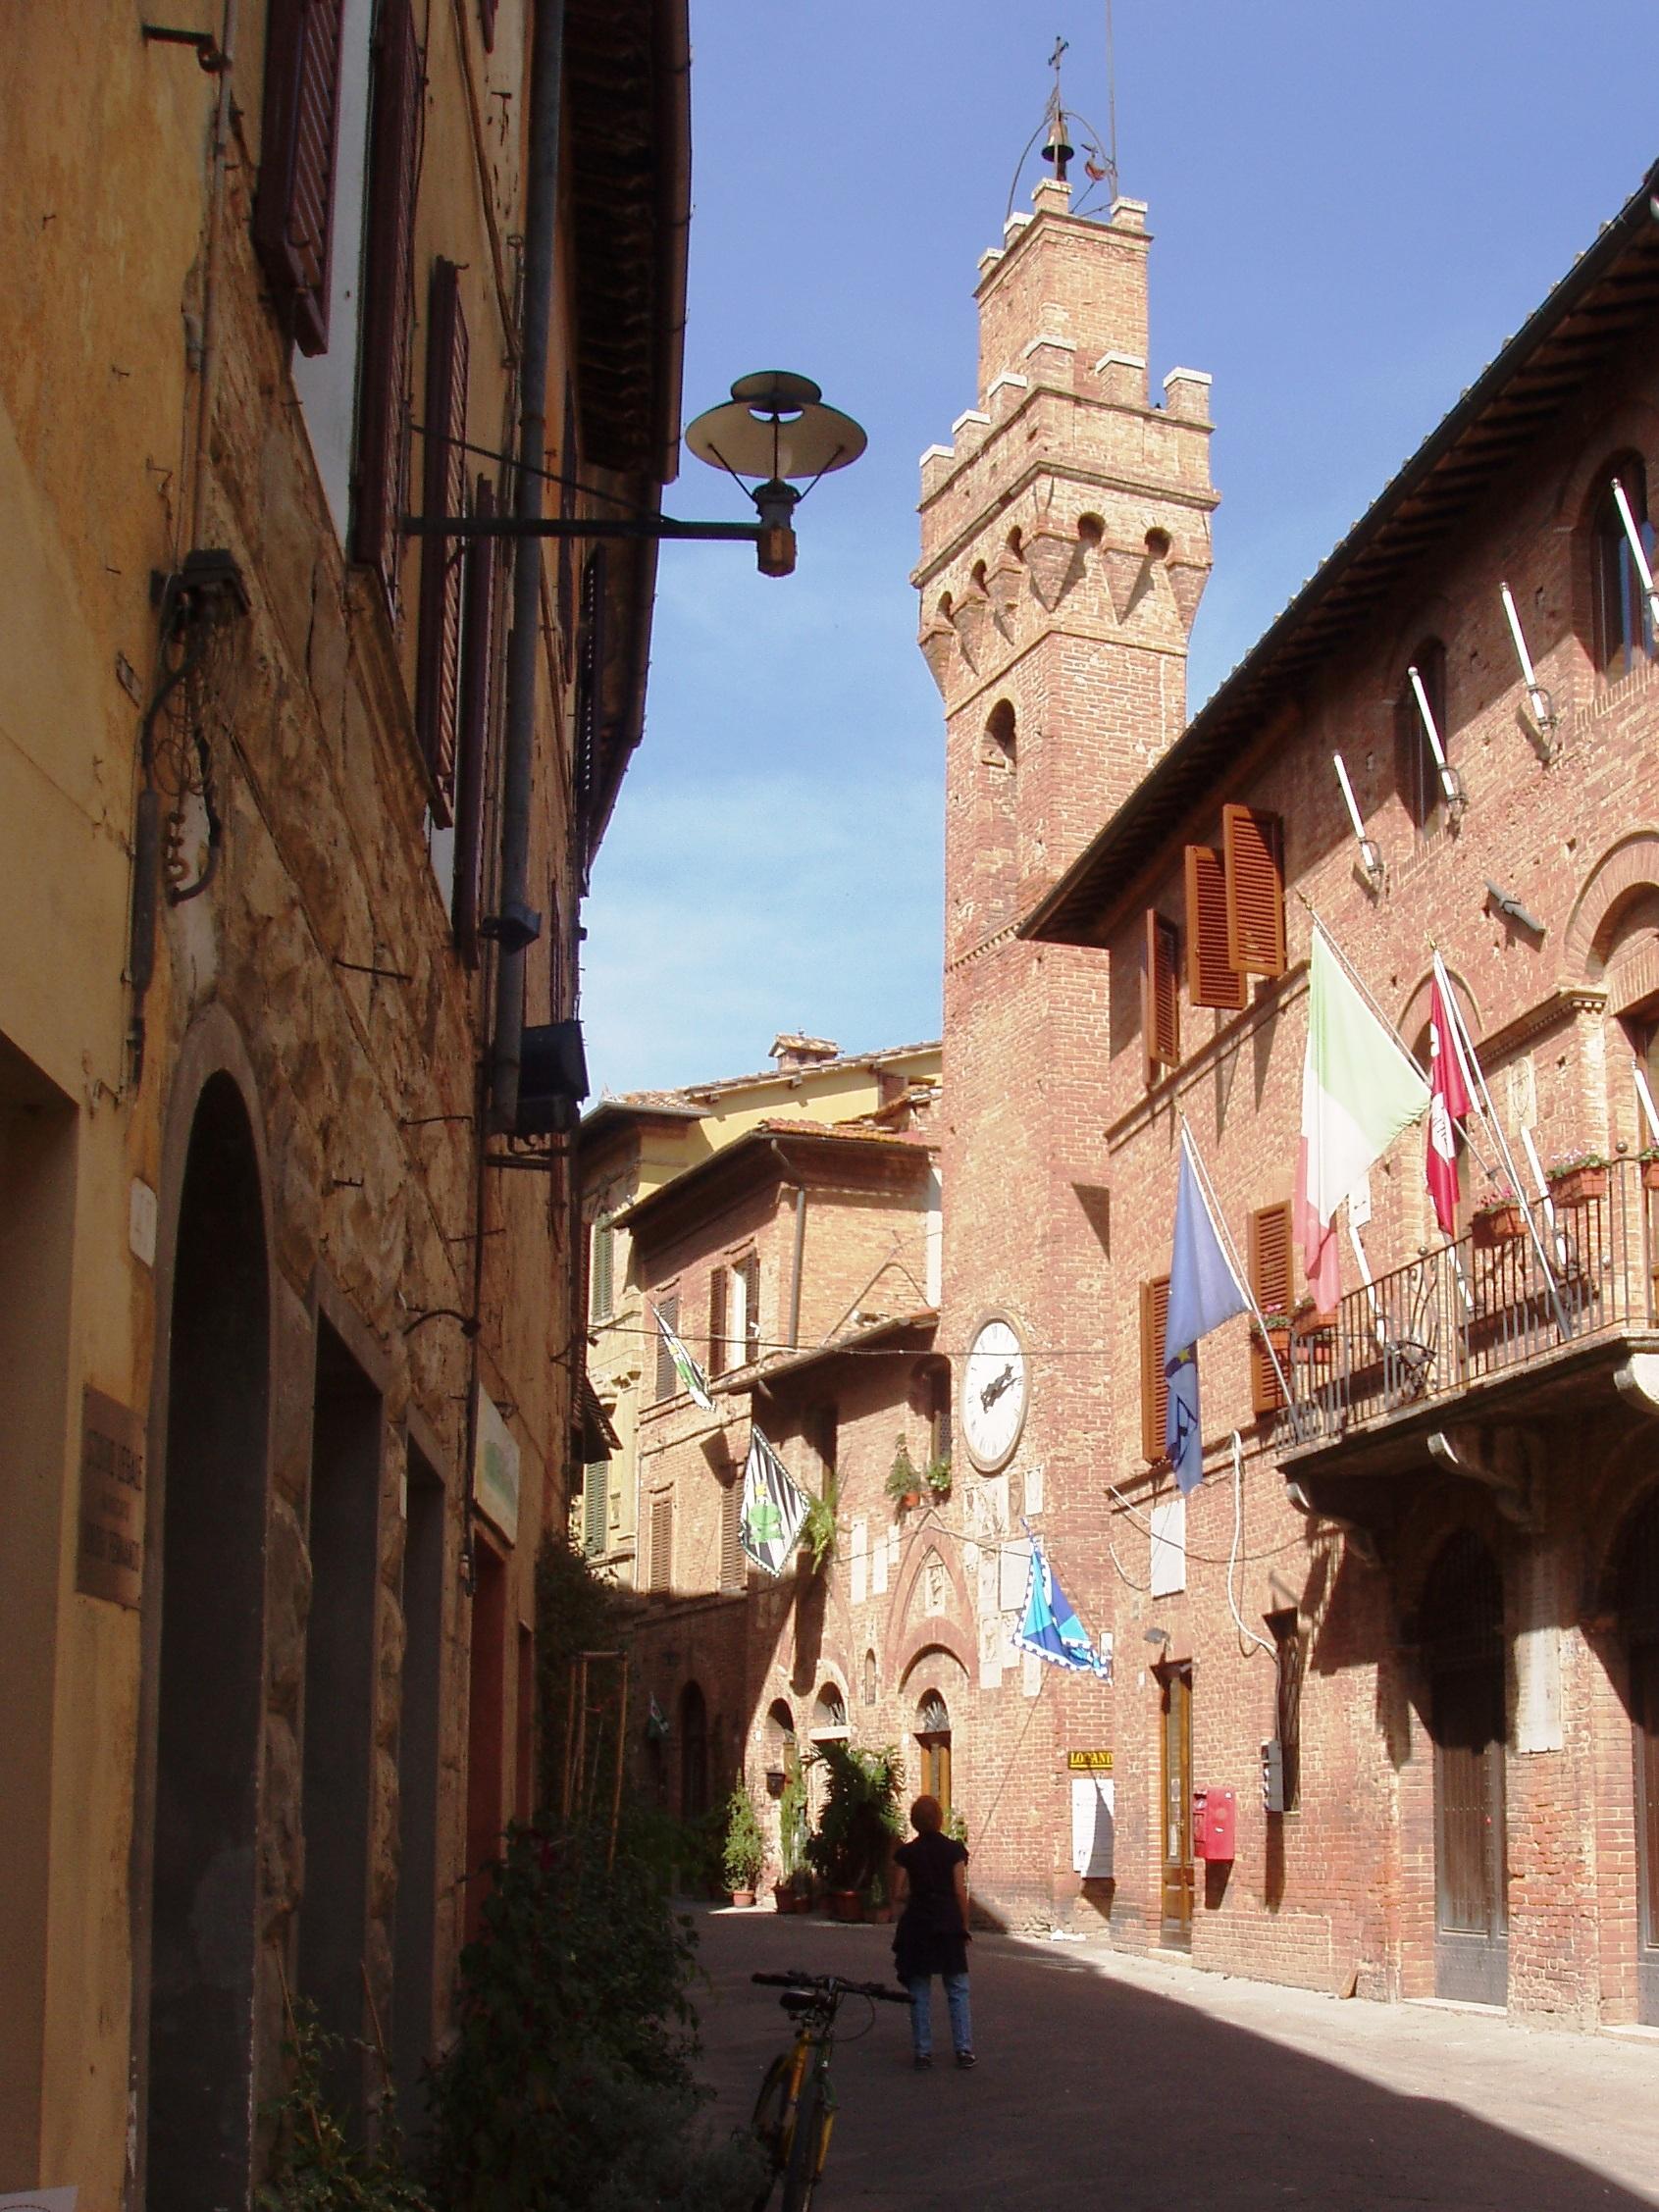 Another+narrow+stone+street.jpg